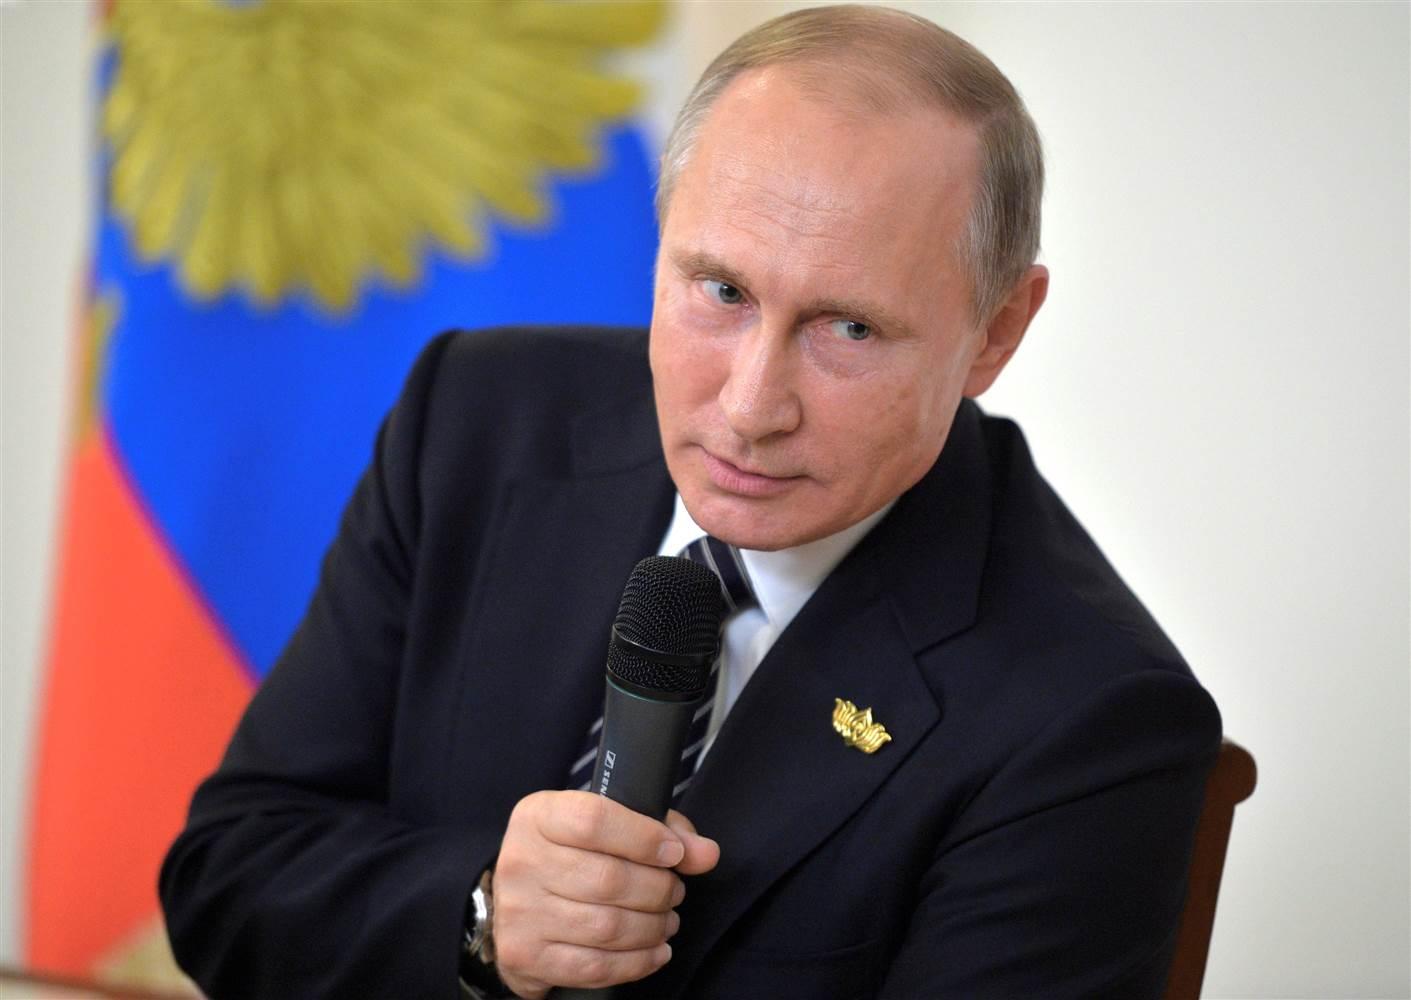 161016-world-russia-putin-brics-1008_b069eb33621e8ebf0c290ad0c4495c2e-nbcnews-ux-2880-1000